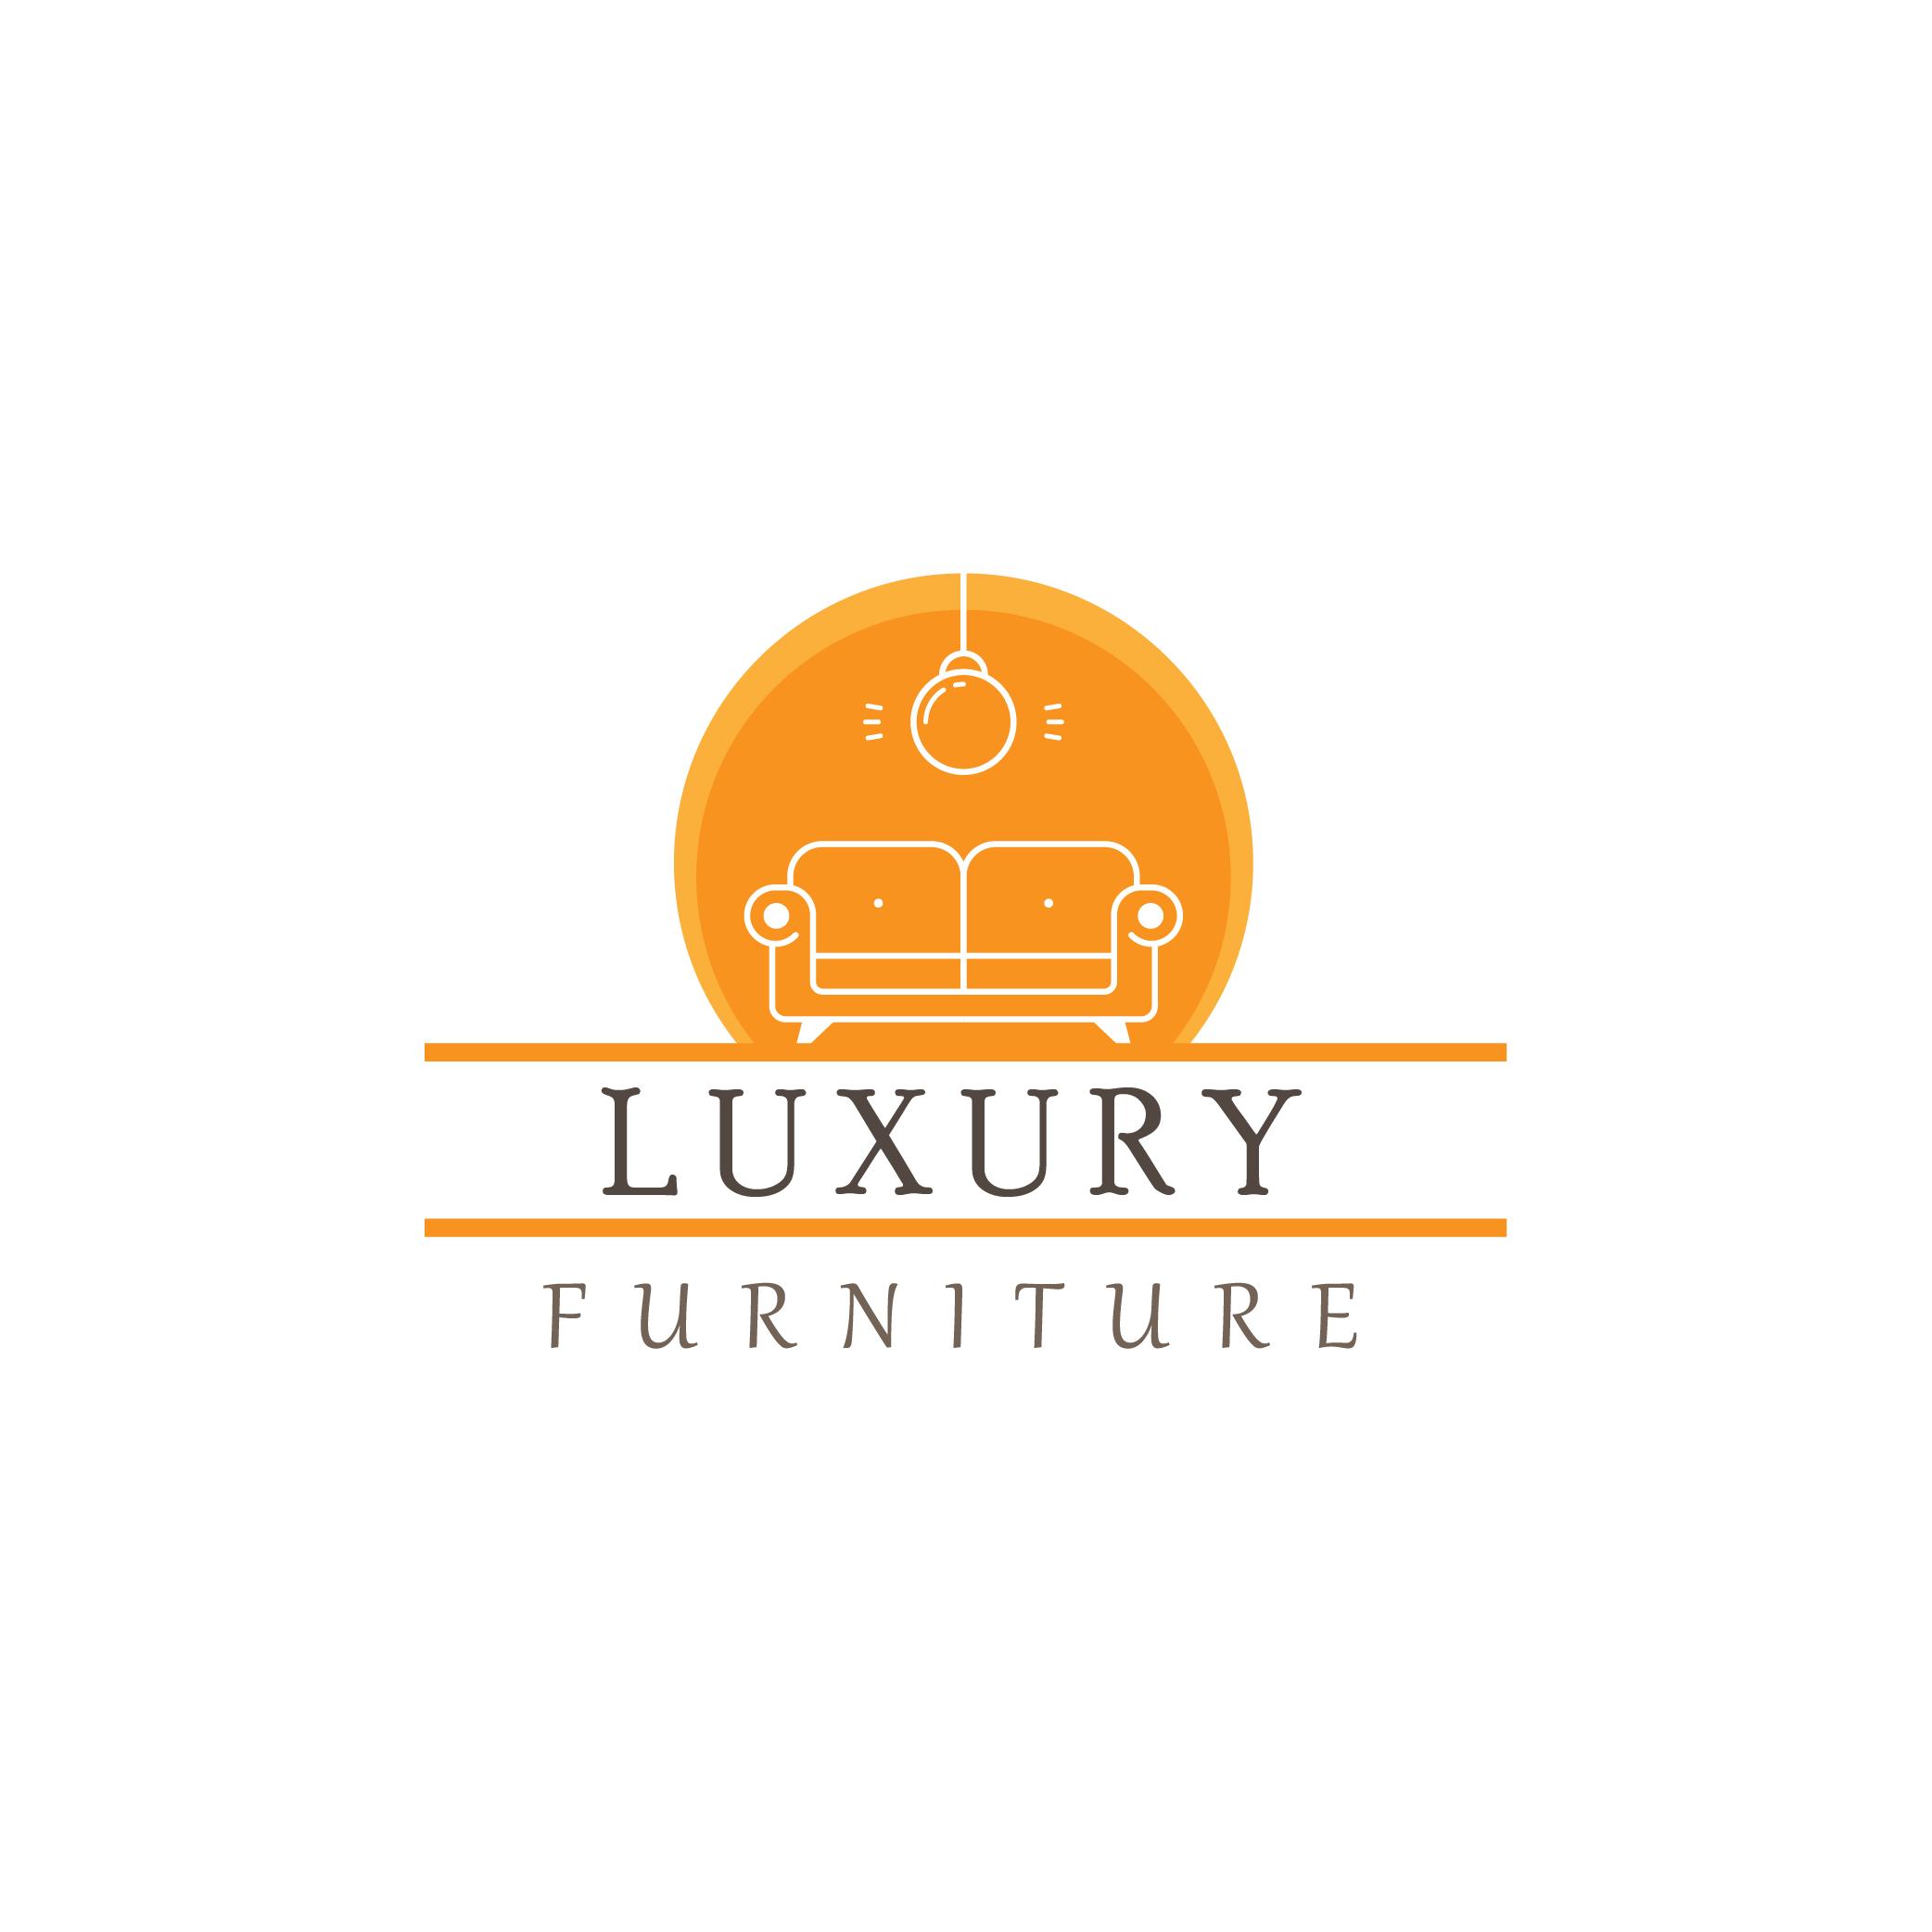 I will design flat minimalist logo design